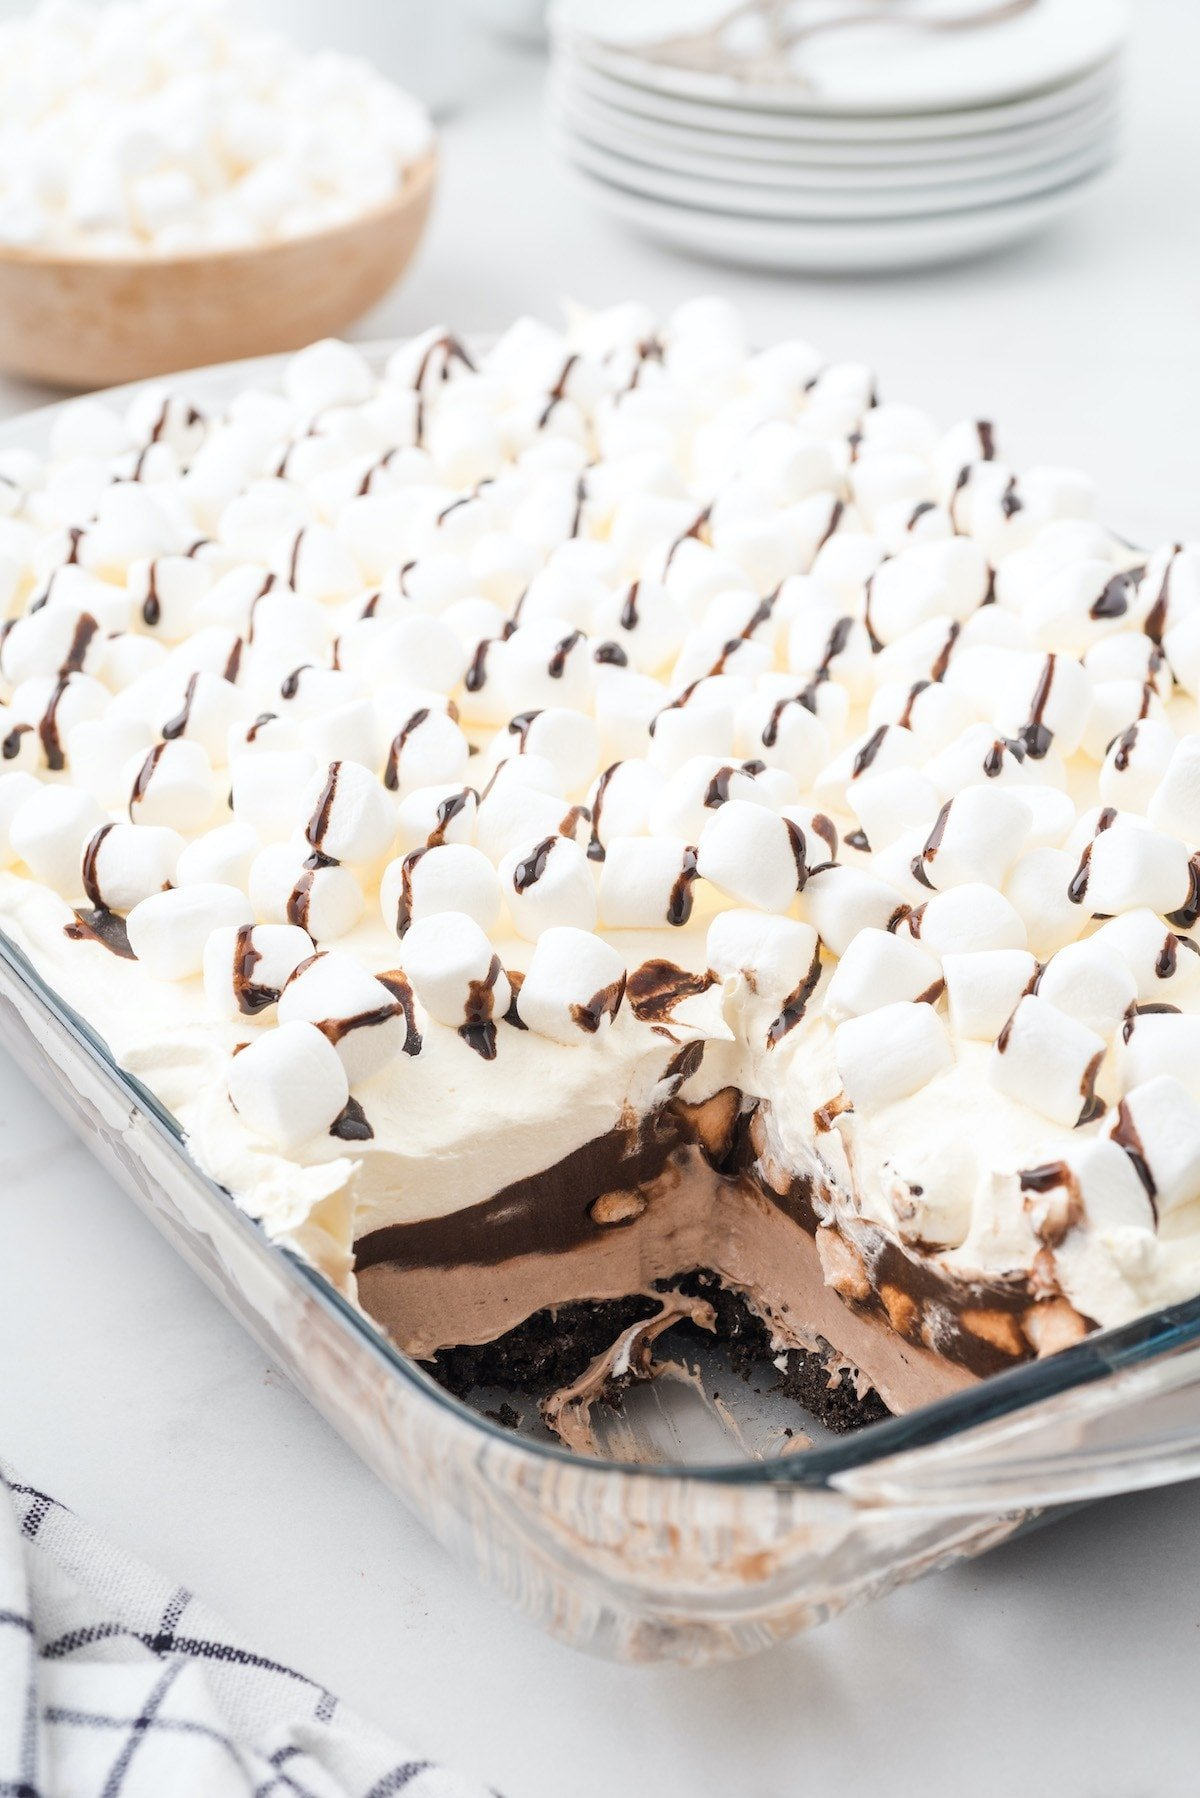 hot chocolate lasagna in baking dish